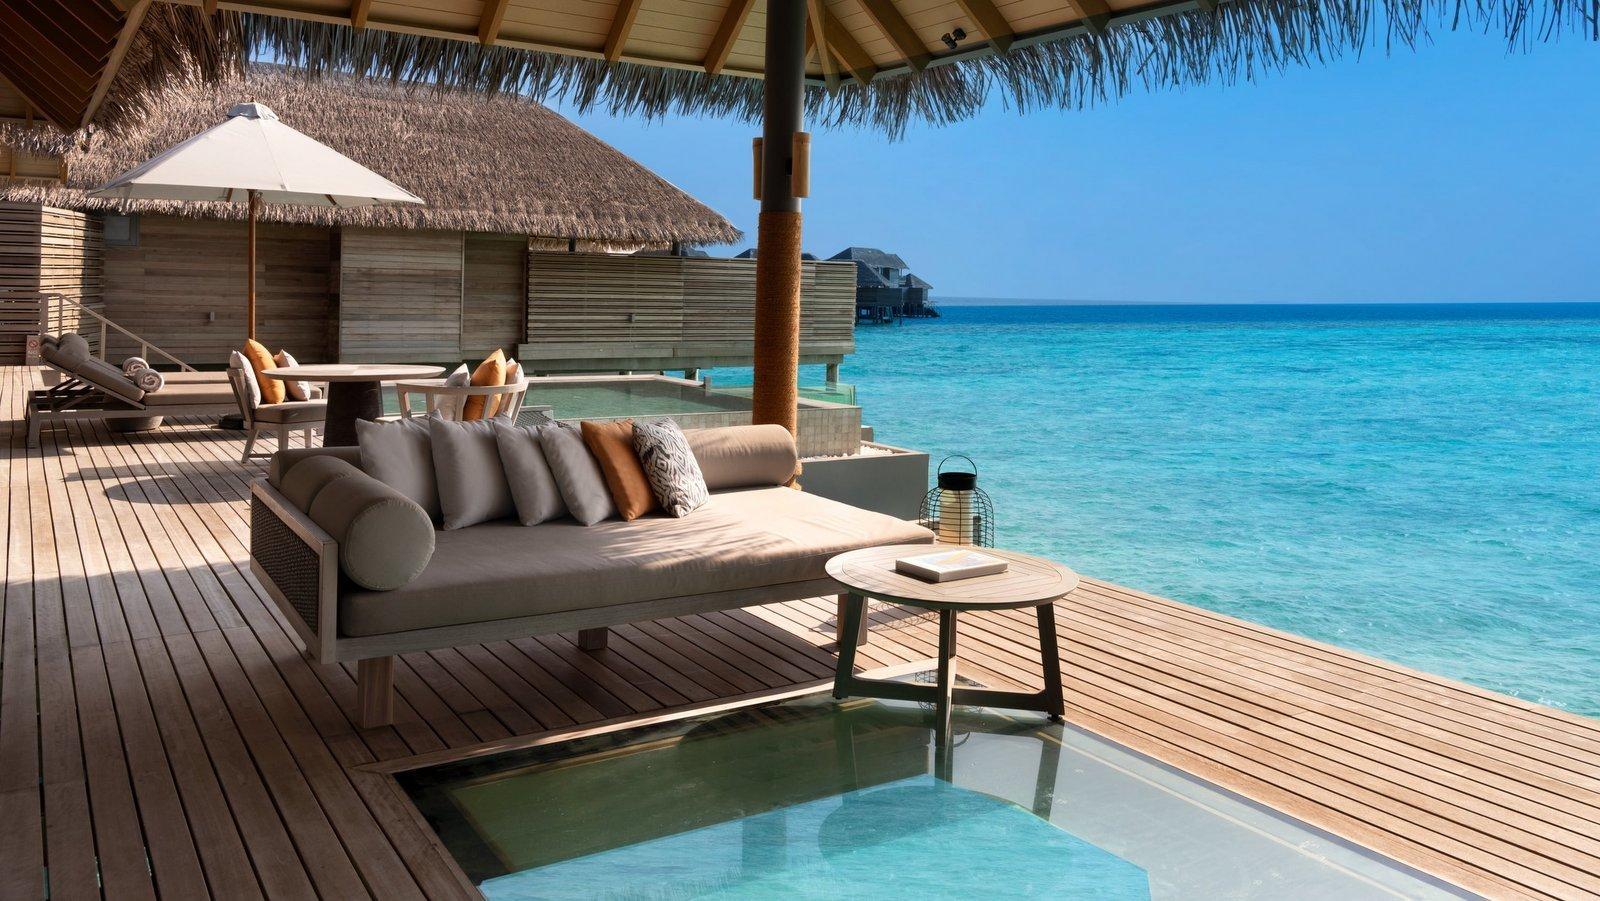 Мальдивы, отель Vakkaru Maldives, номер Over Water Pool Residence